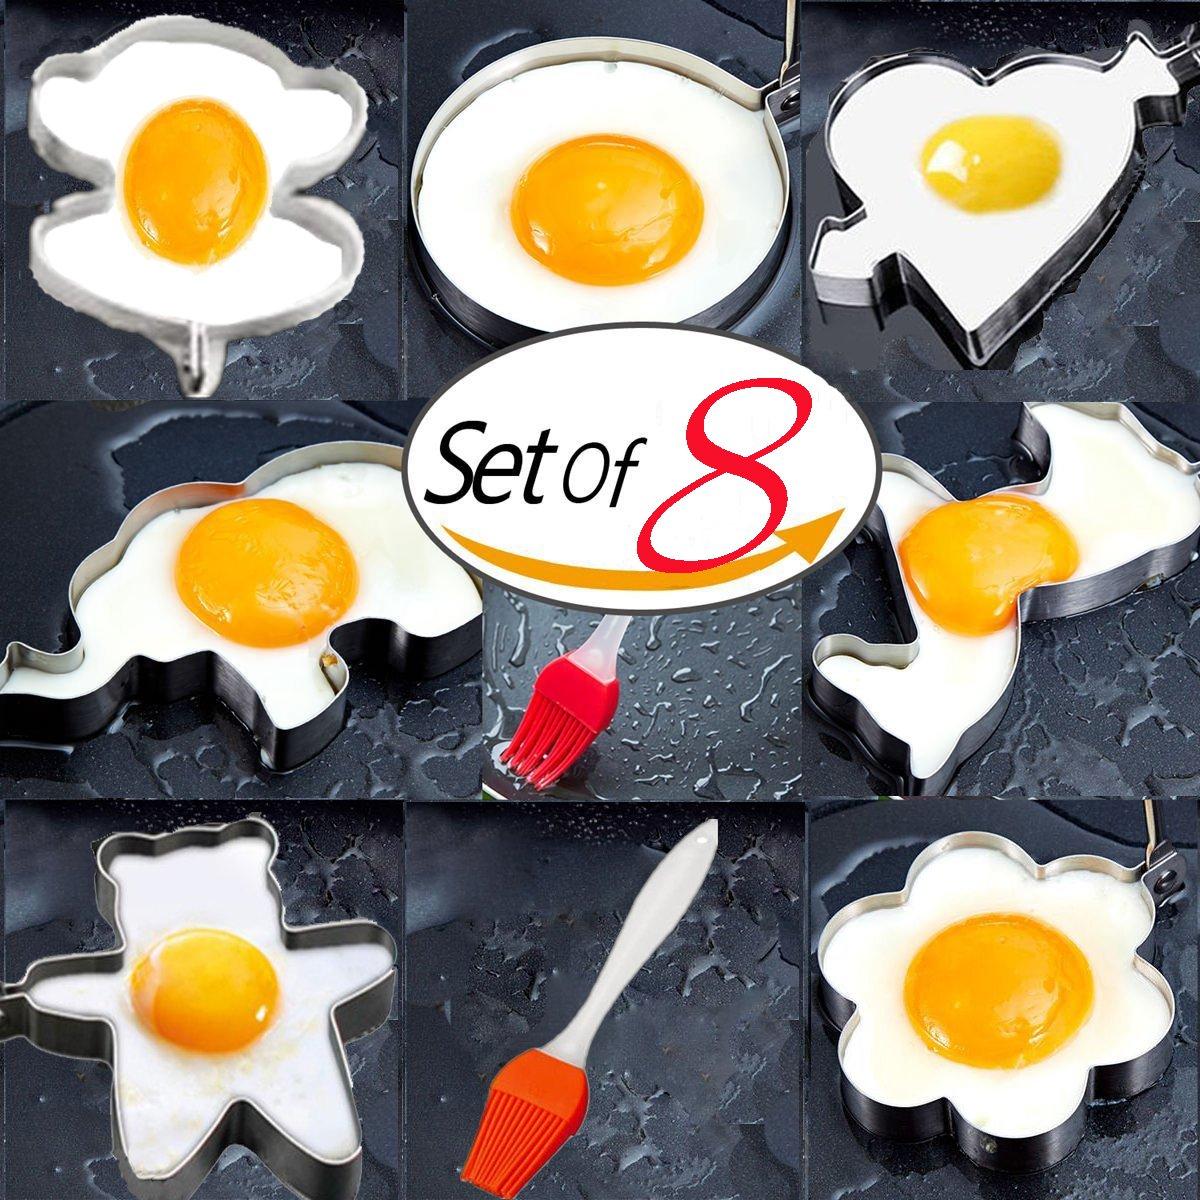 kiyogoods Fried Egg Mold 8PCS Ring Pancake Cooker Nonstick Stainless Steel Frying Cooking Baking, Egg Shaper Pancake Maker with Handle, monkey elephant pony bear kids love eggs kitchen tool (#1)